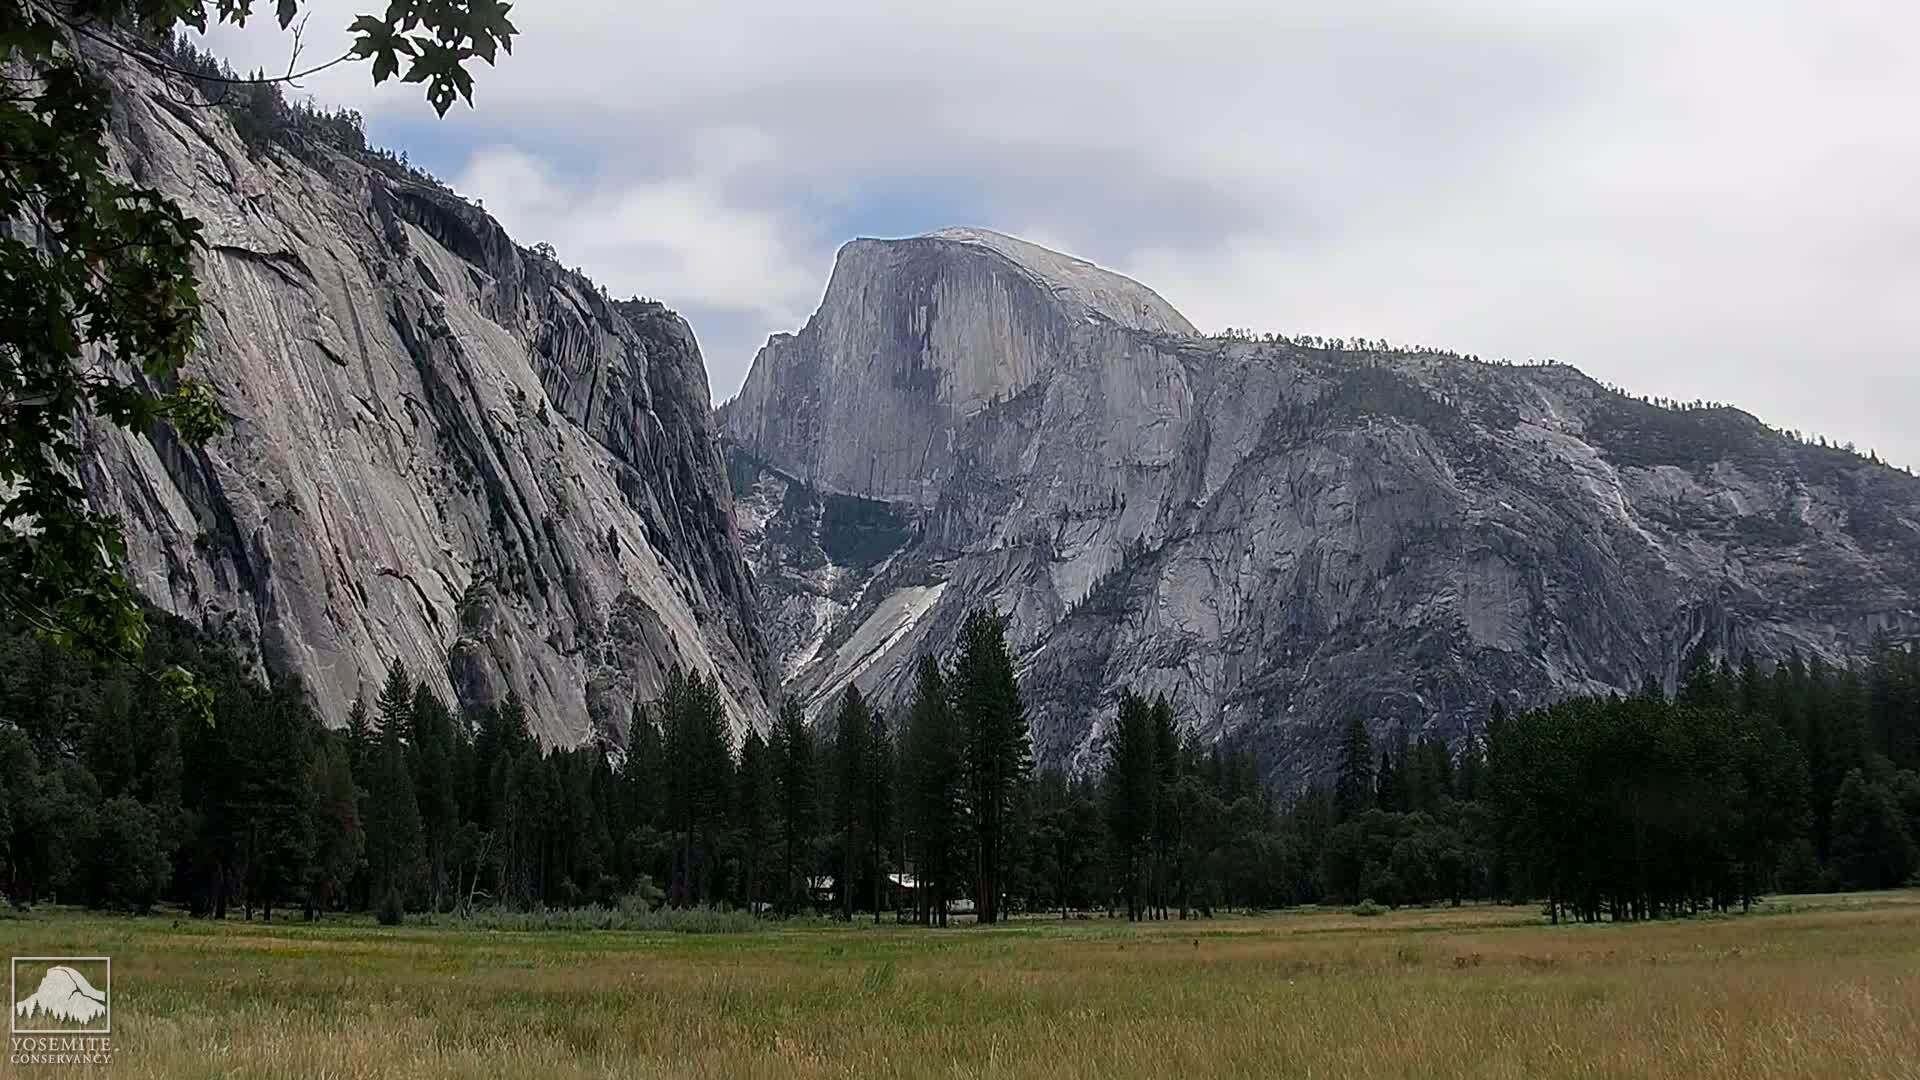 Yosemite National Park, California Tue. 12:45